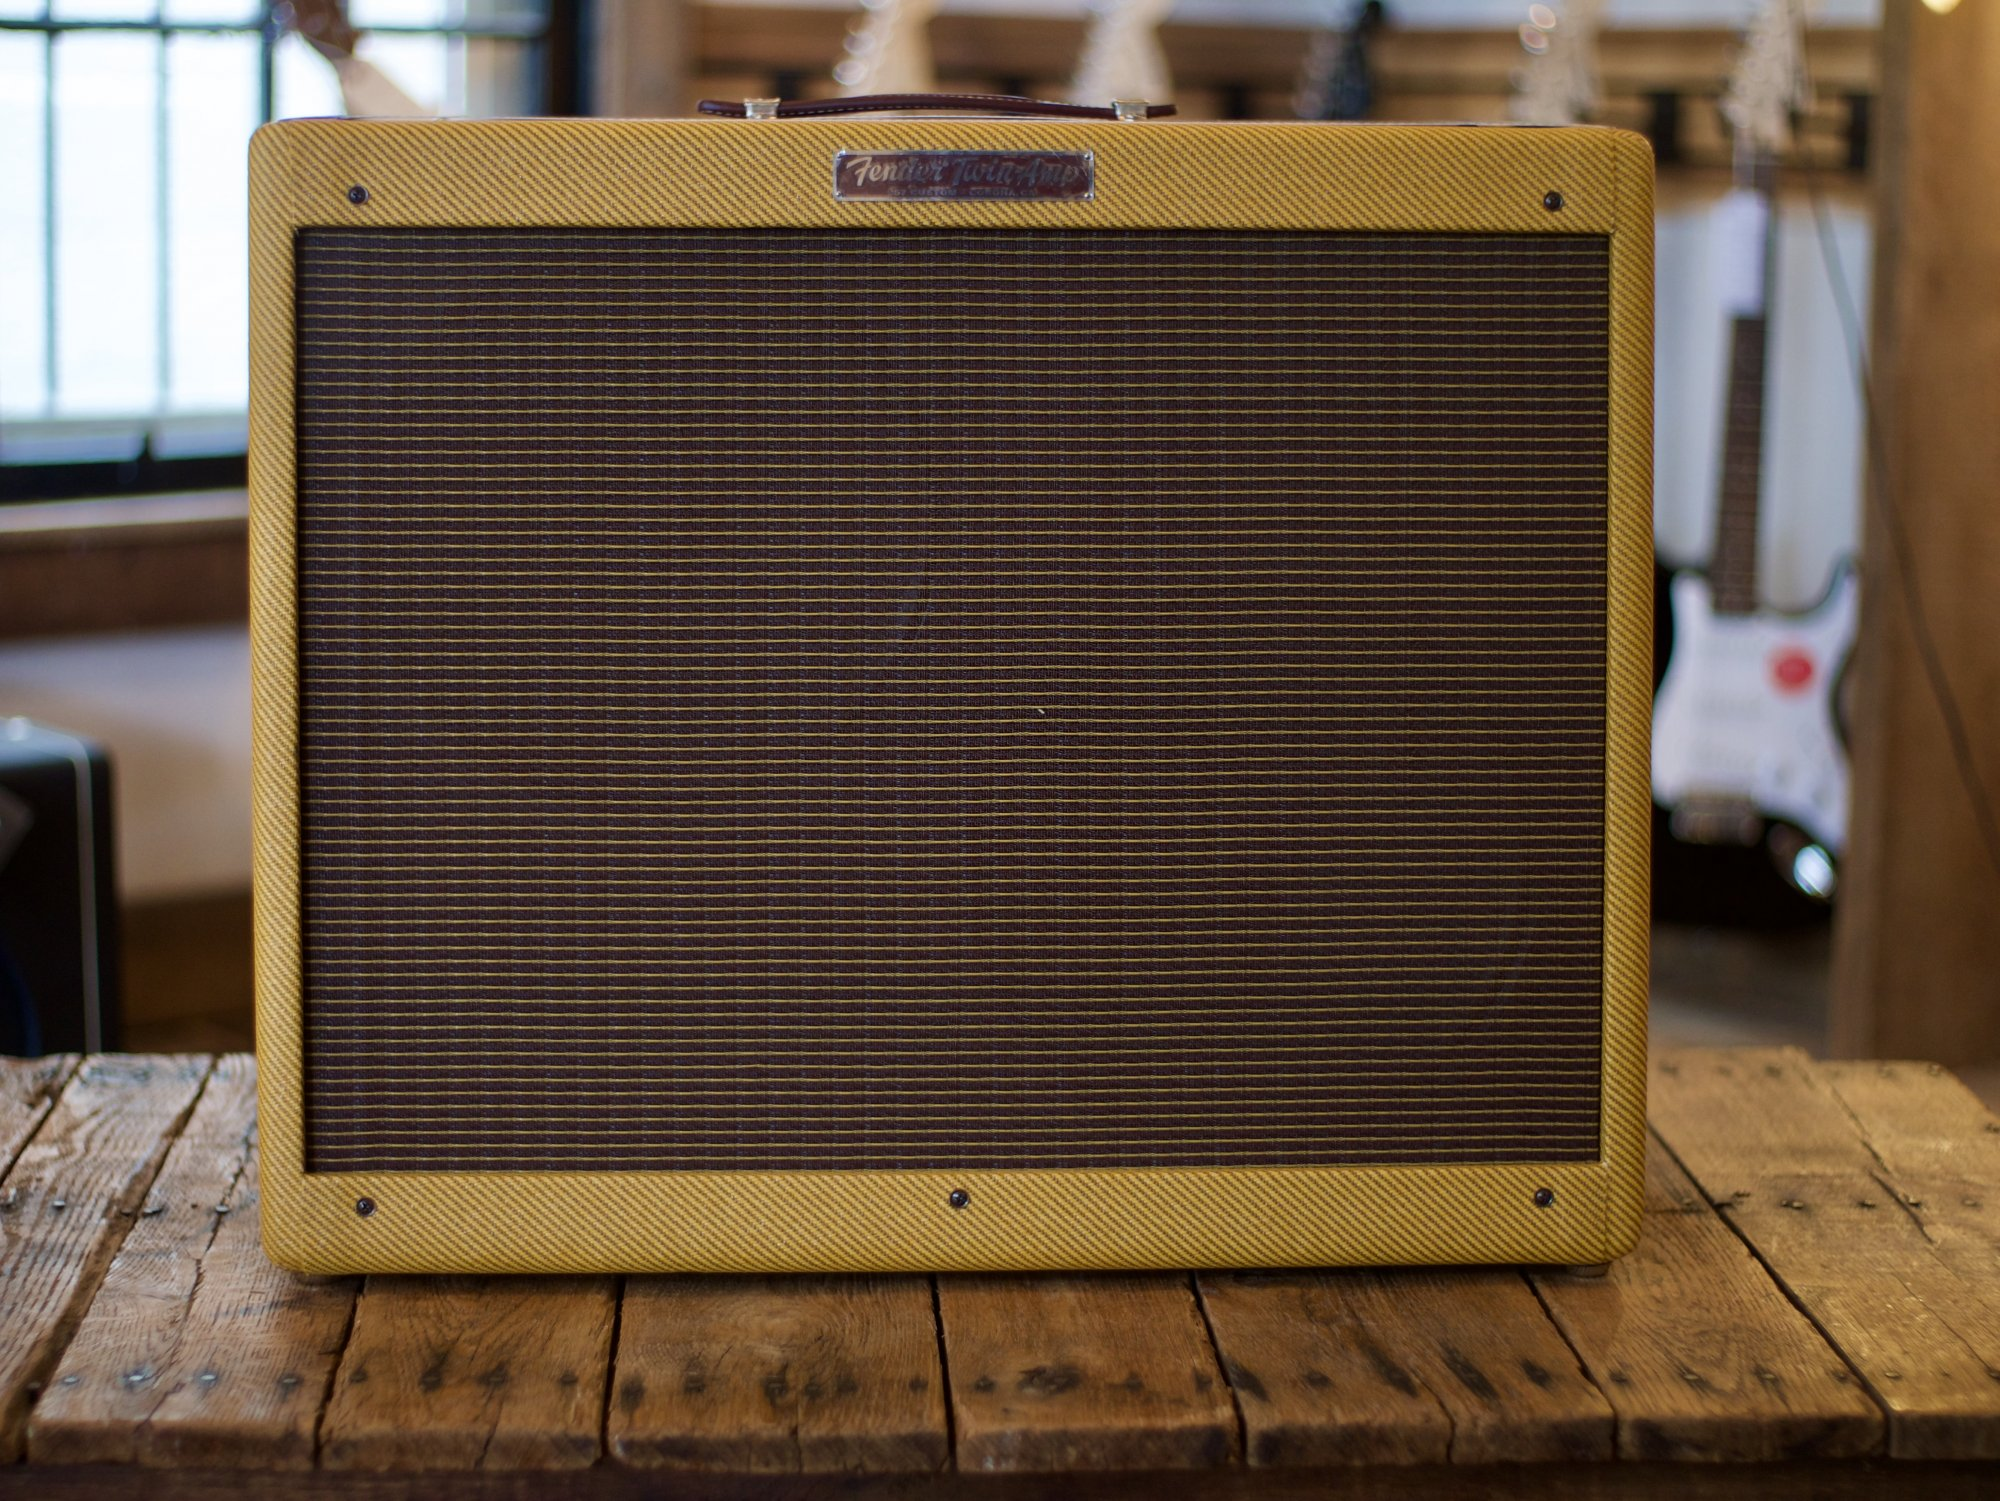 Fender 57' Custom Twin Amp